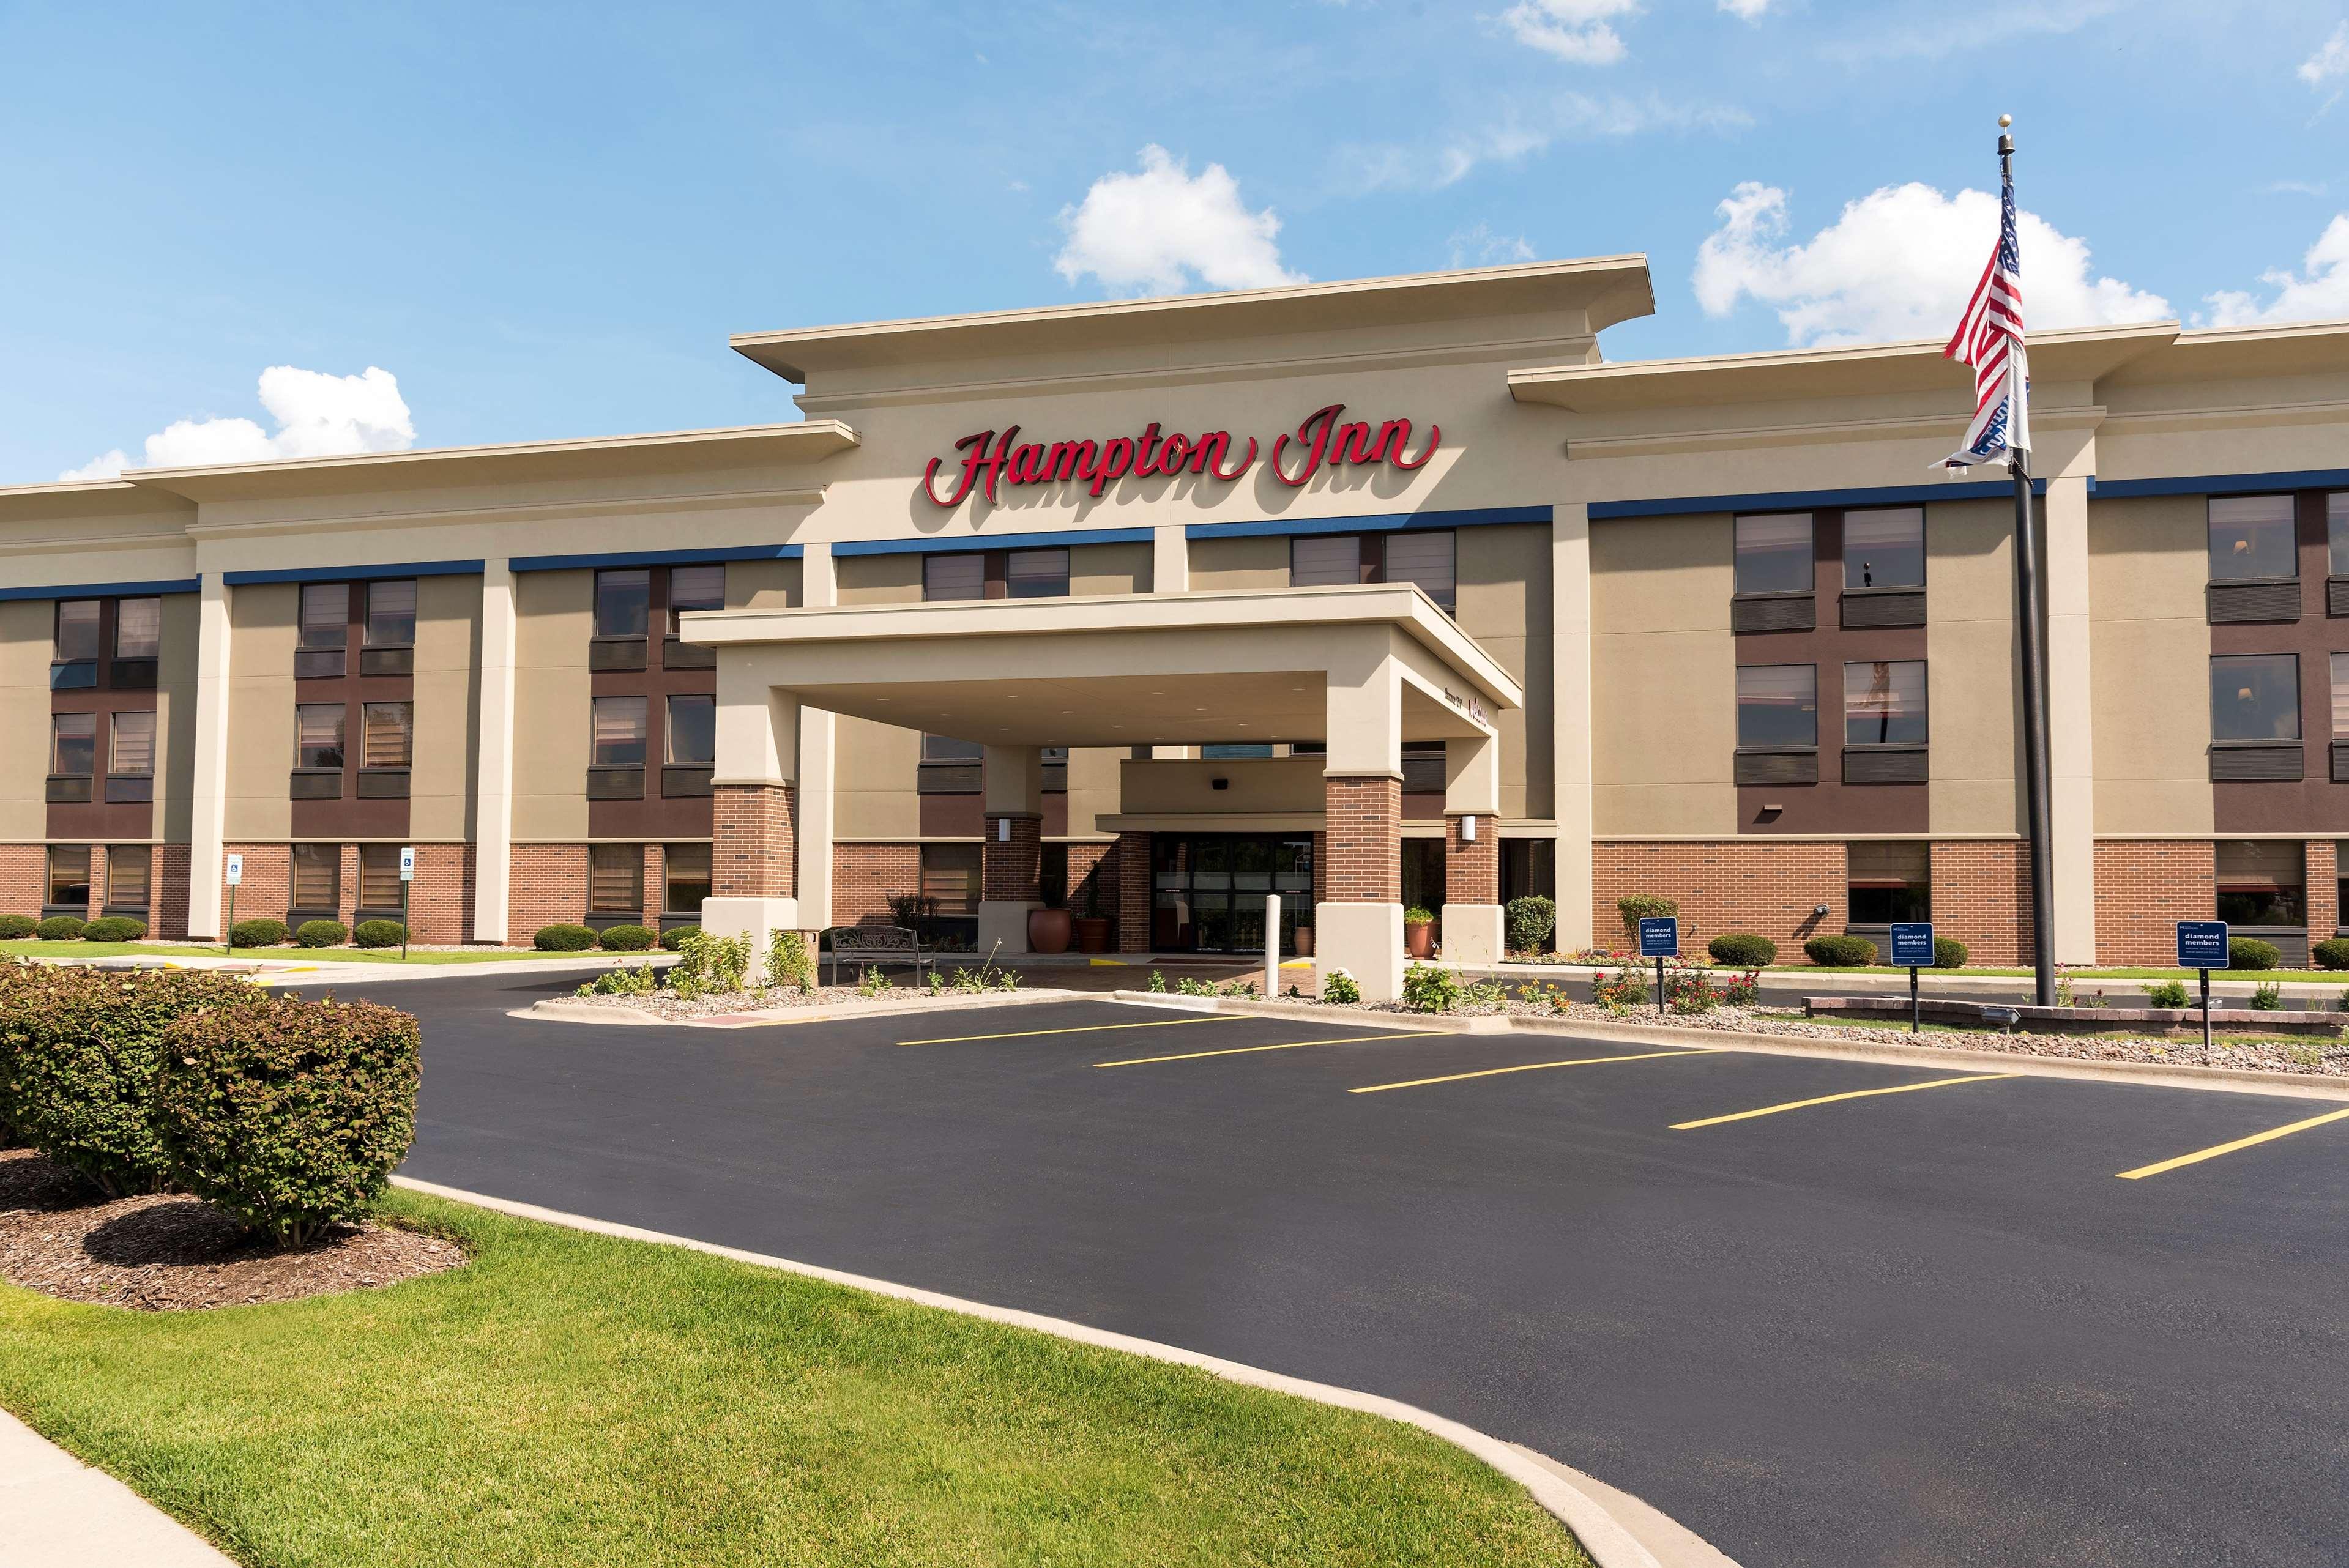 Hampton Inn Joliet - I-80 image 3